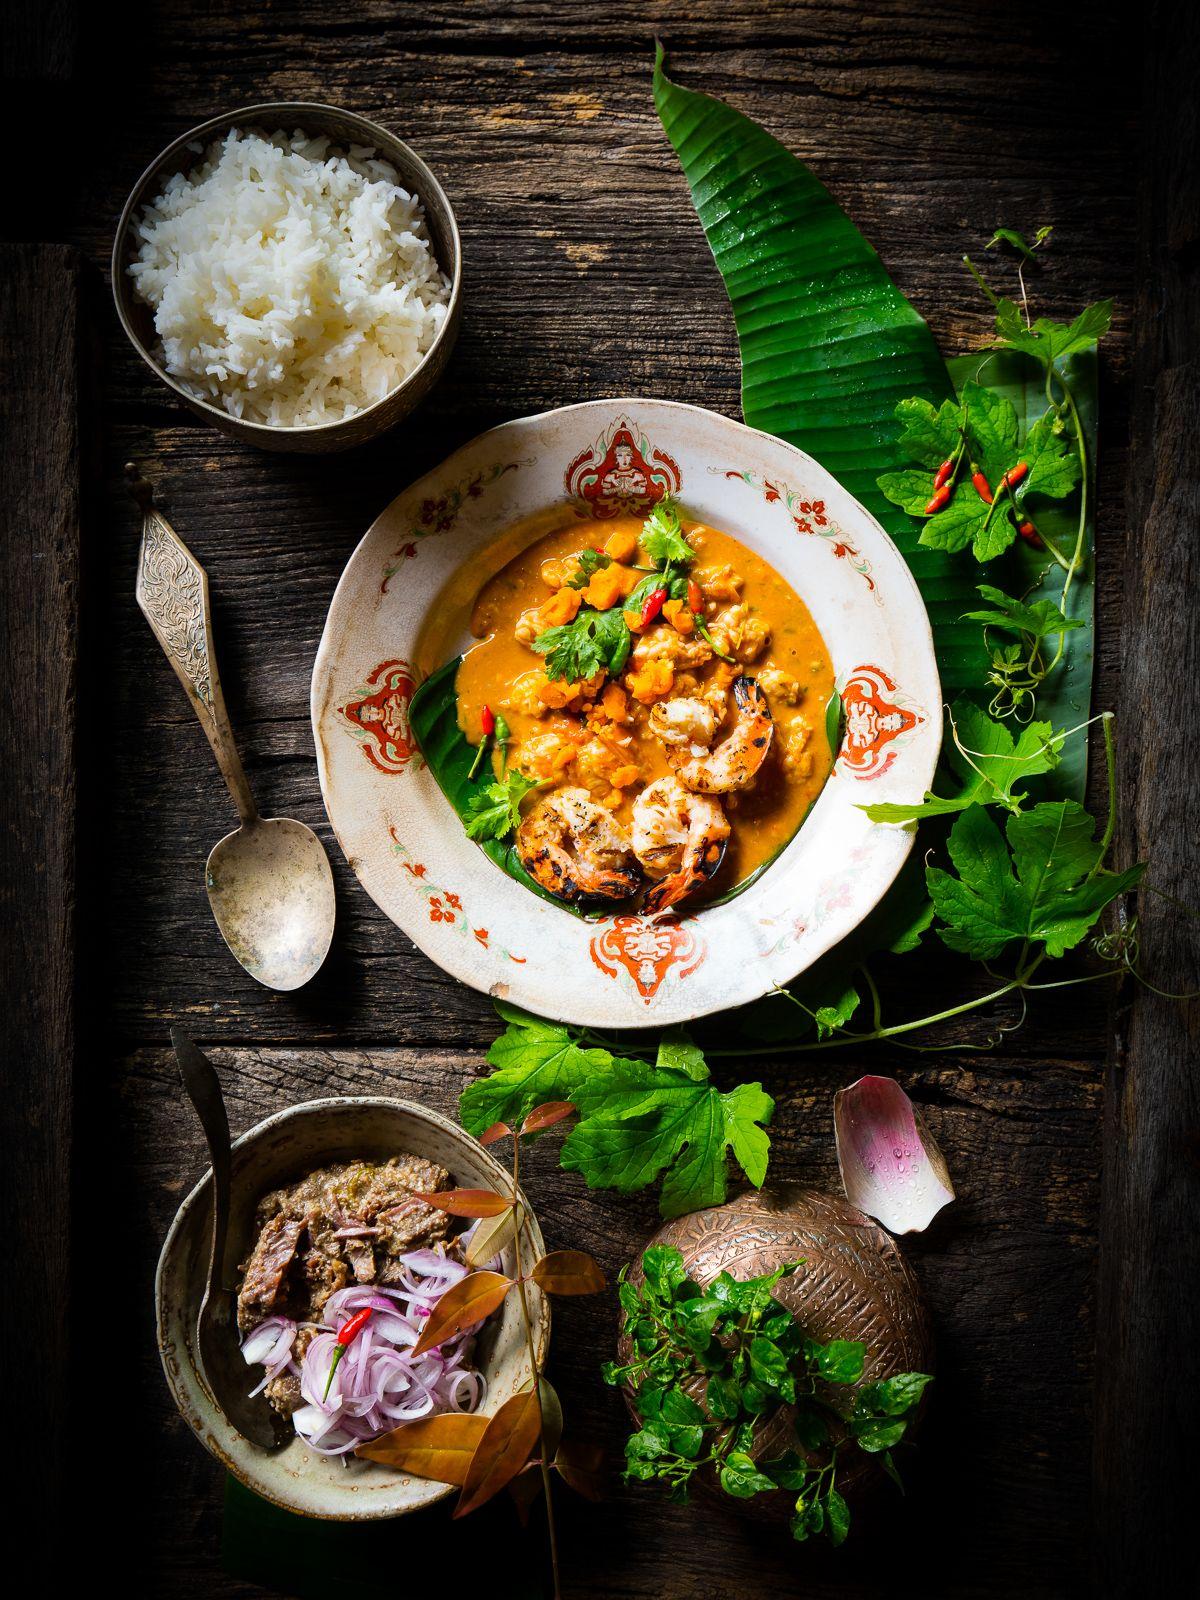 Bangkokbold Tabletop Photographer I N Thai I N Time